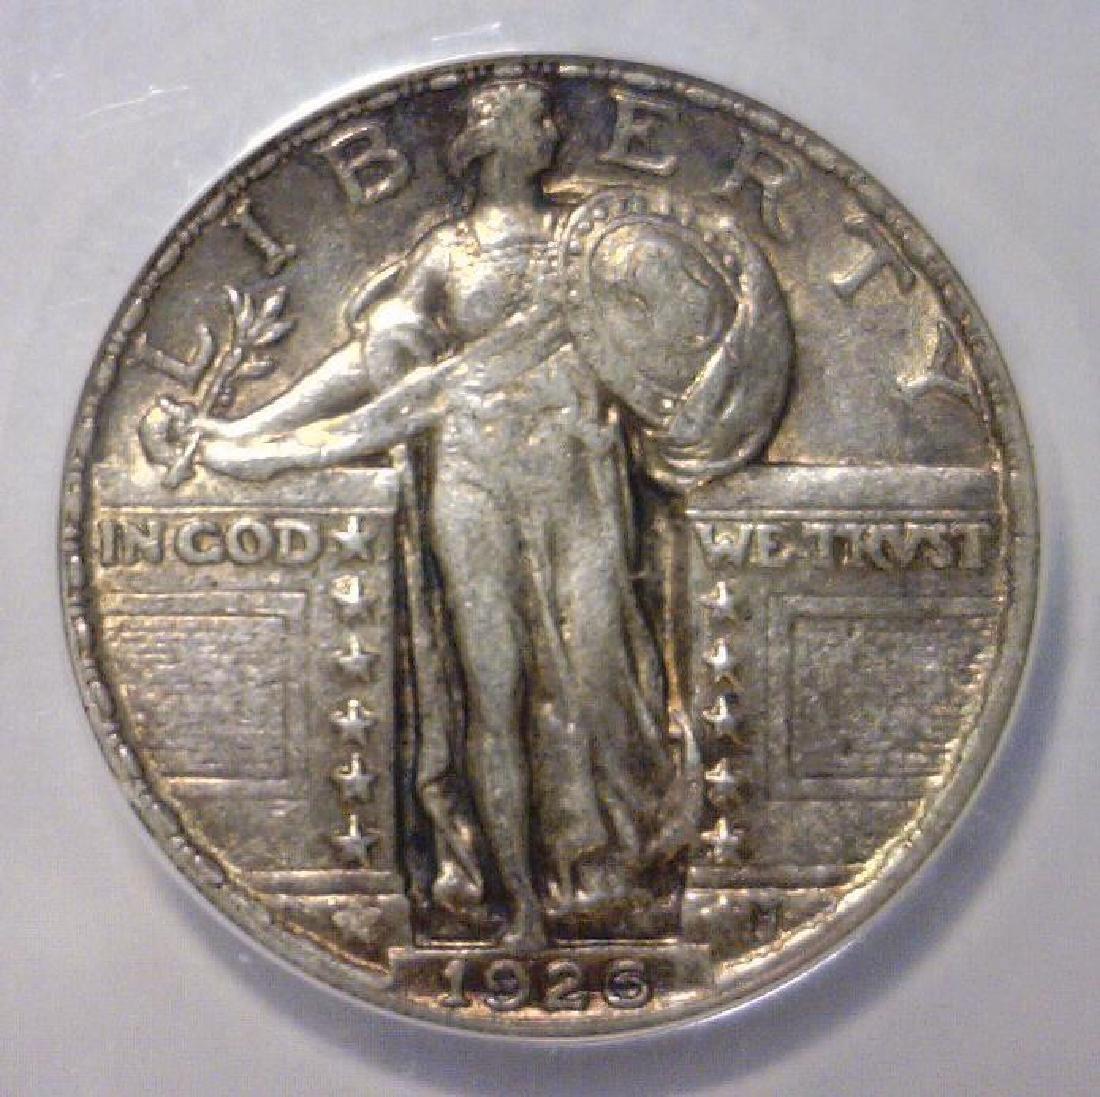 1926 Standing Liberty Silver Quarter ANACS XF EF45